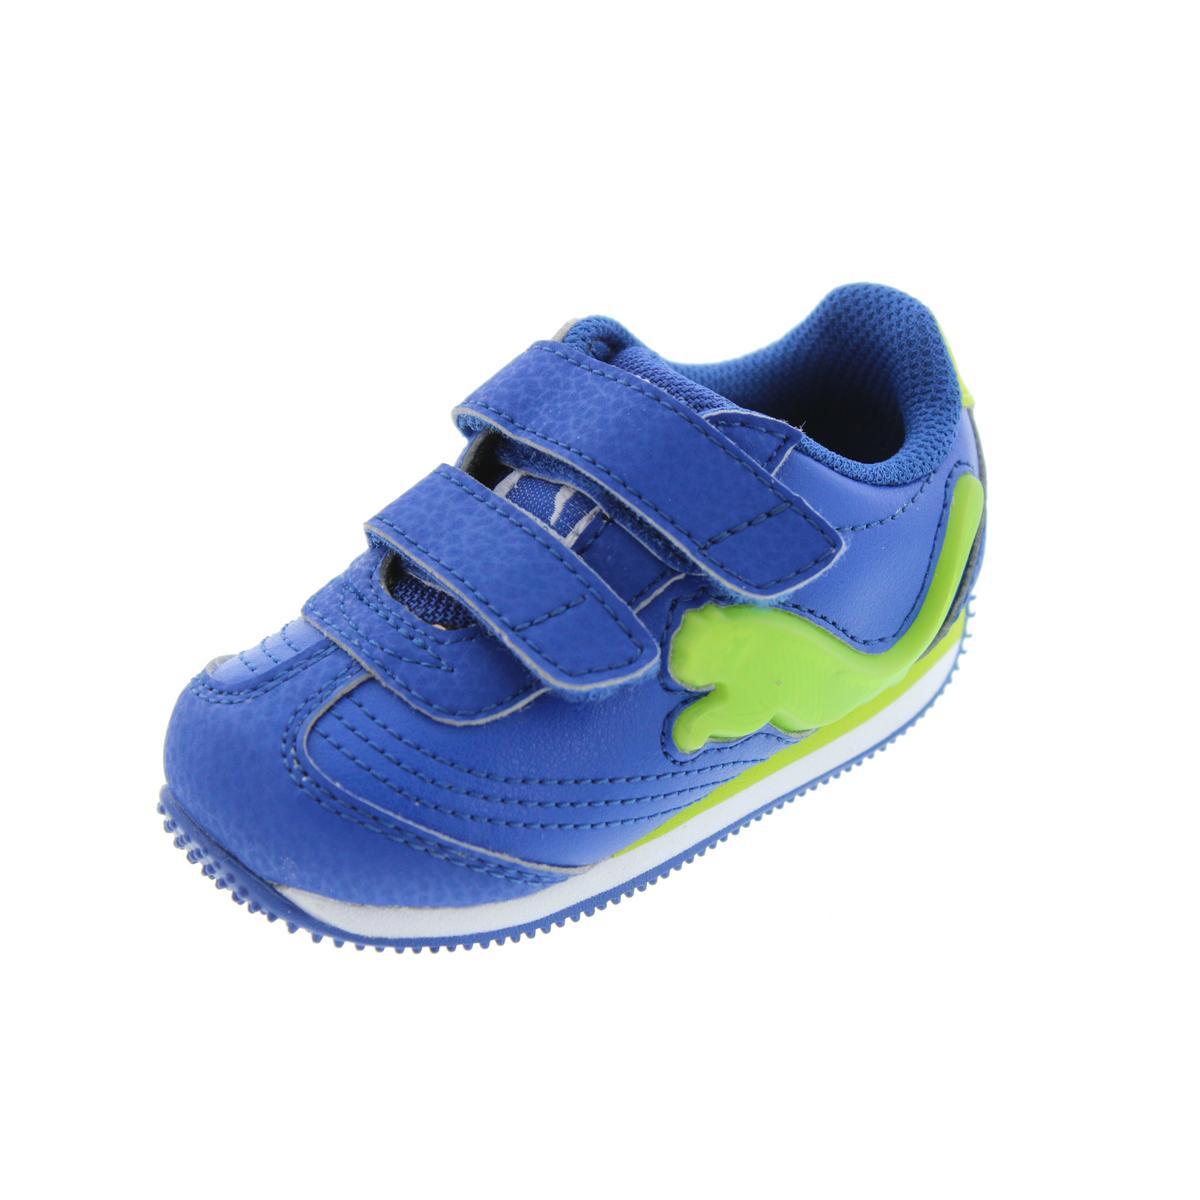 Puma 0423 Speeder Illuminesc Light-Up Toddler Sneakers ...